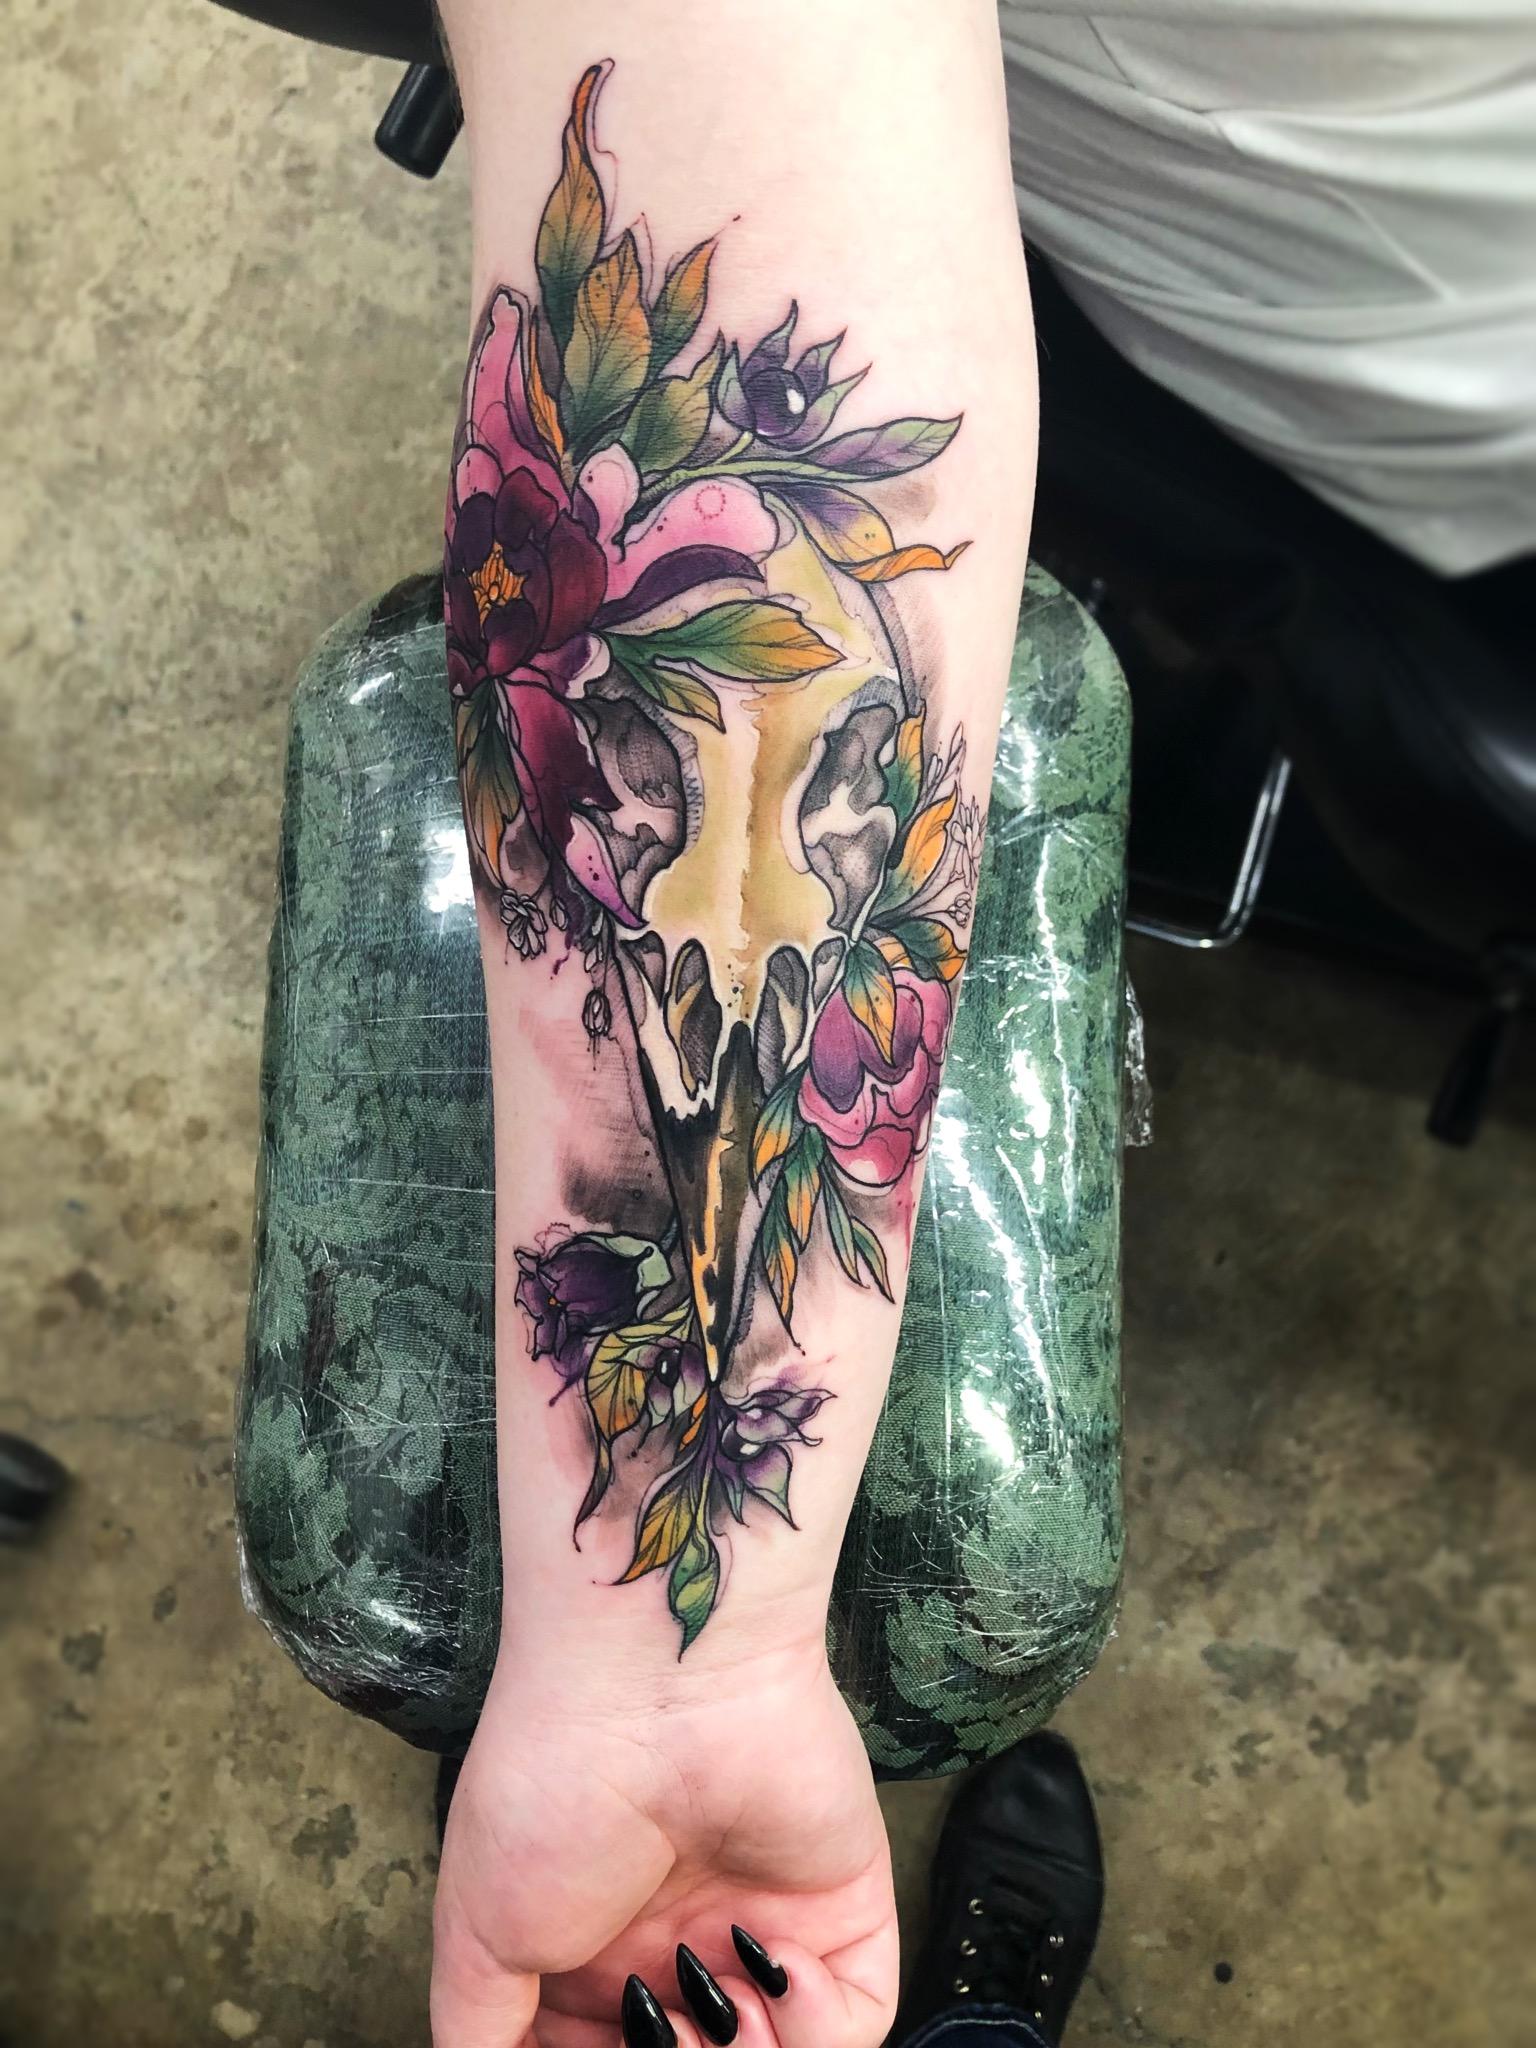 Award Winning Tattoo Artist in Sicamous